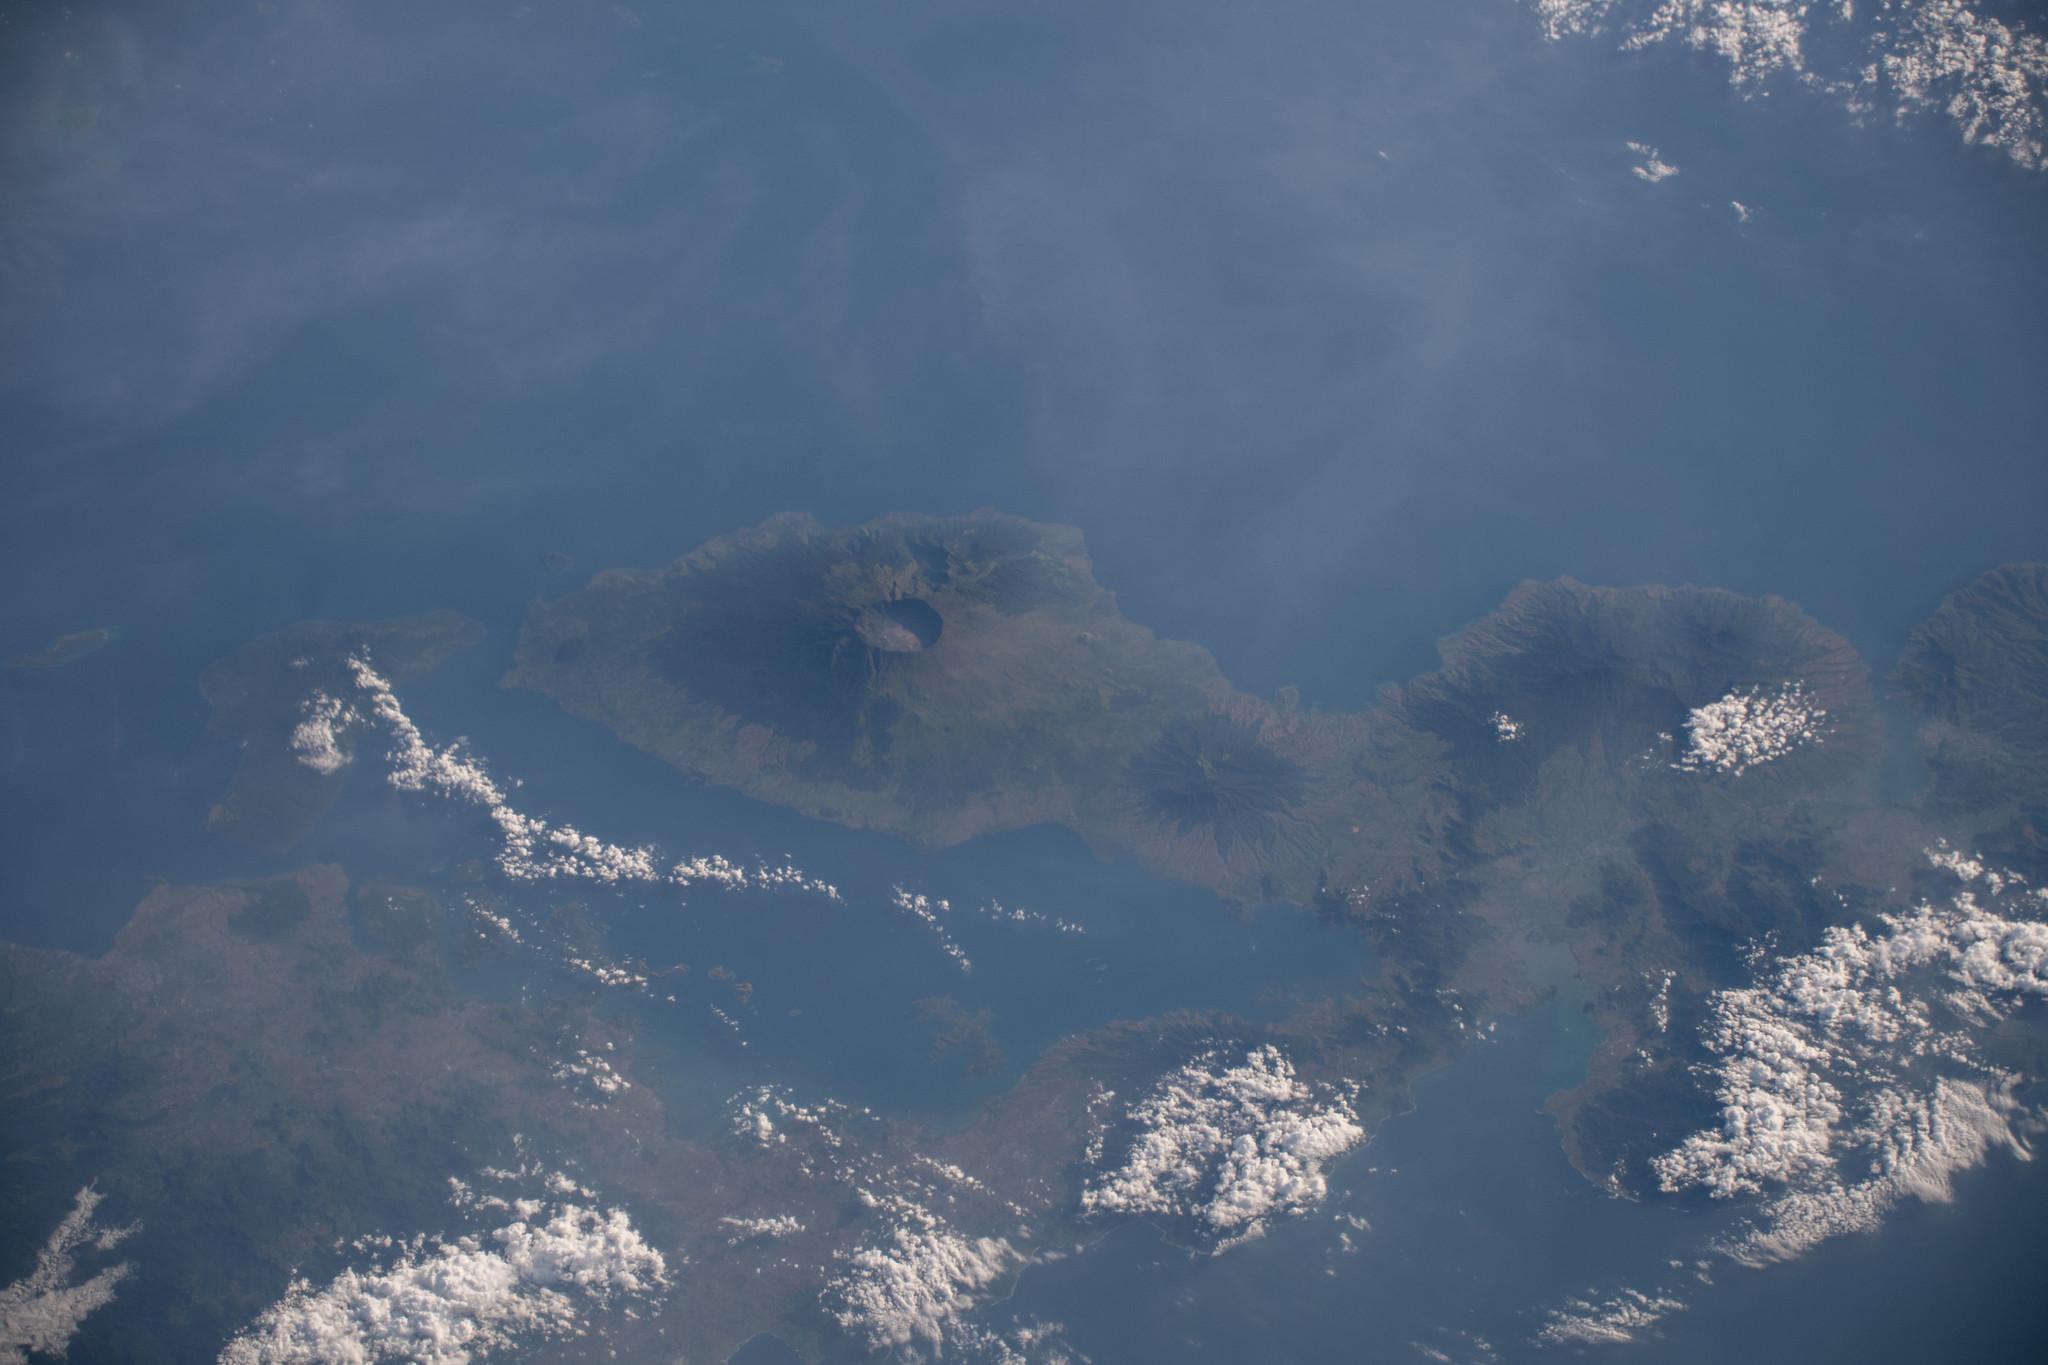 The active volcano of Mount Tambora